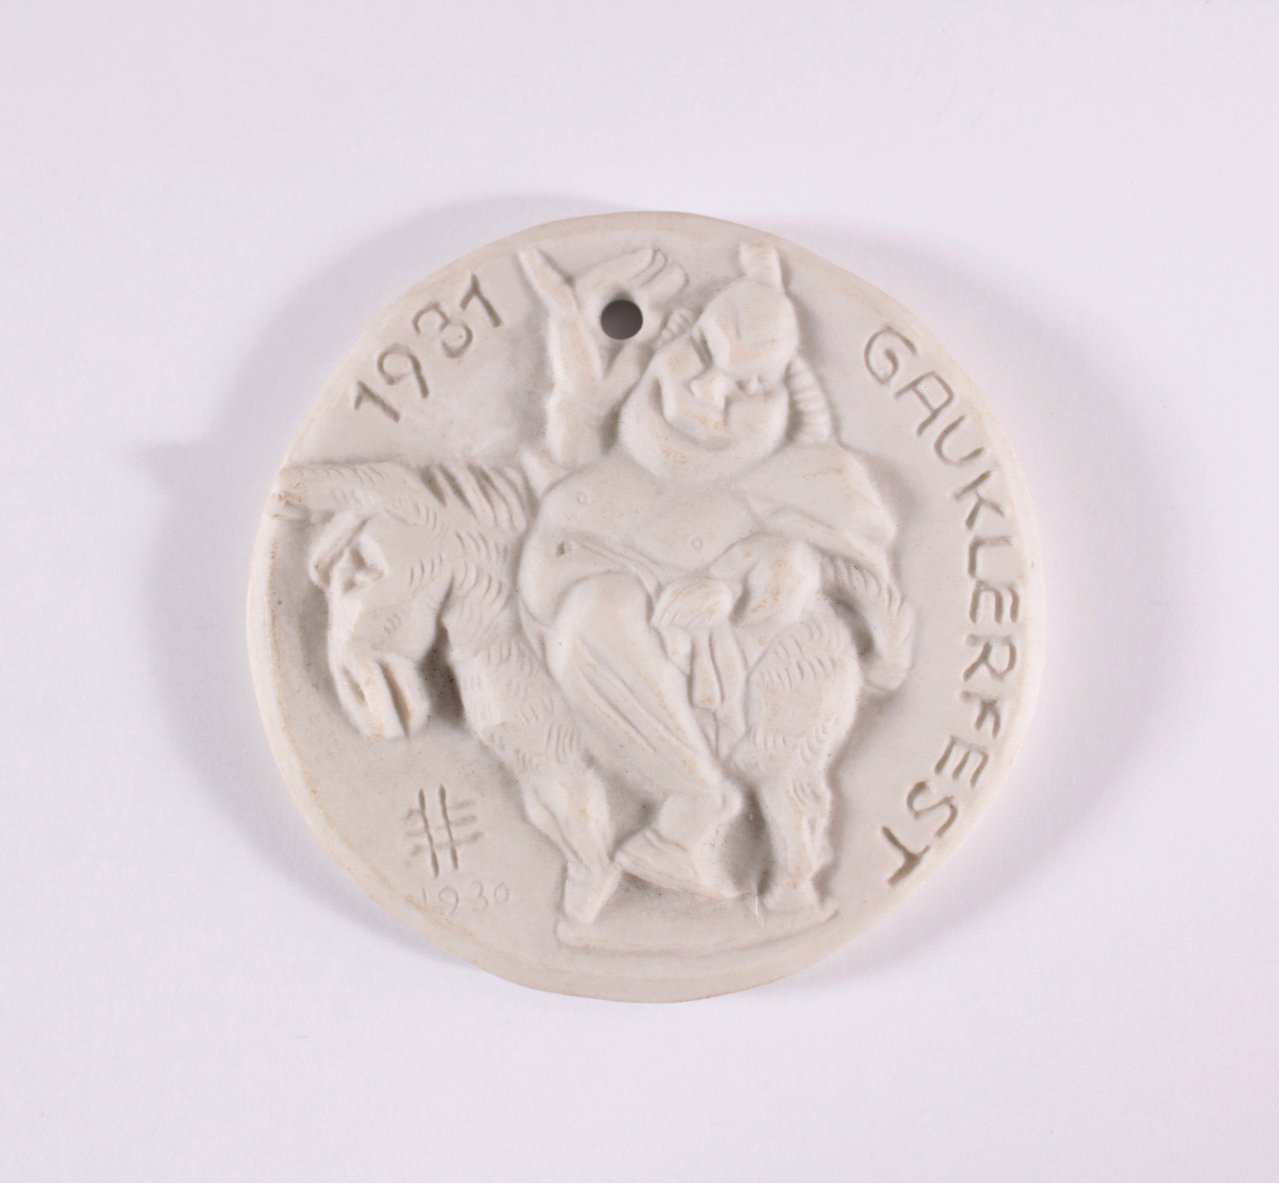 Gipsform Medaille Gauklerfest 1931 Dresden